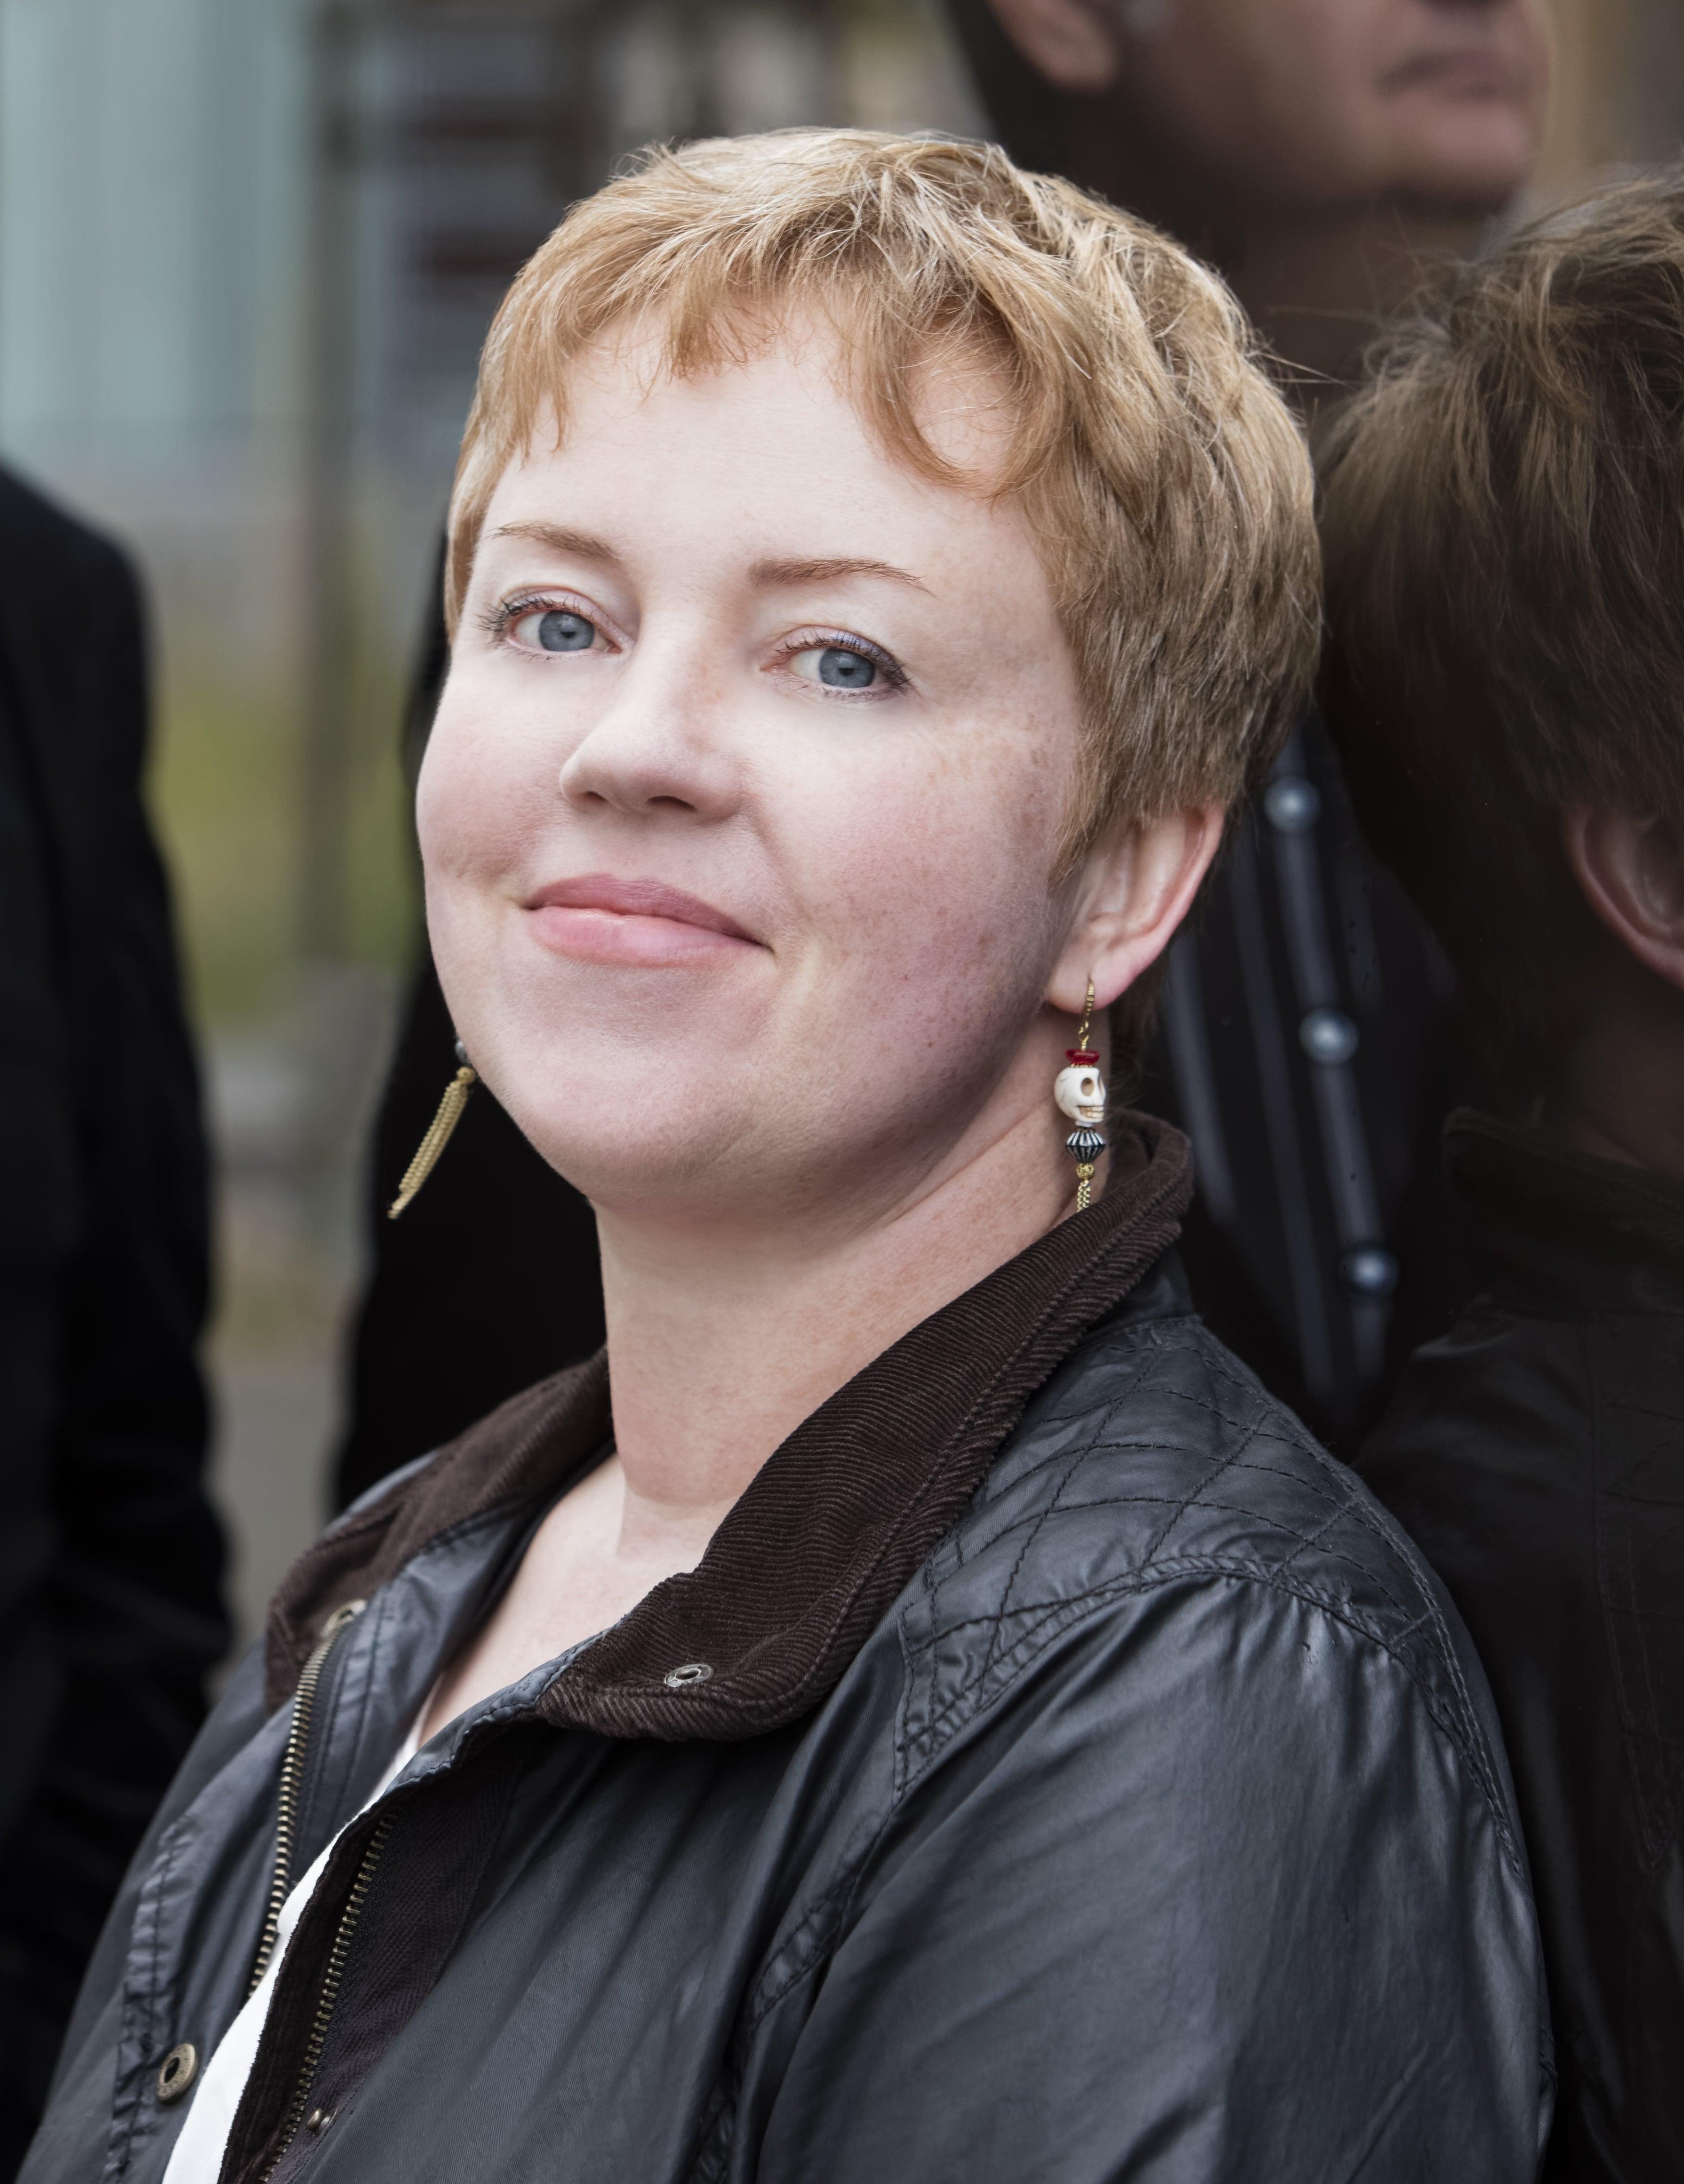 Astrid Ule